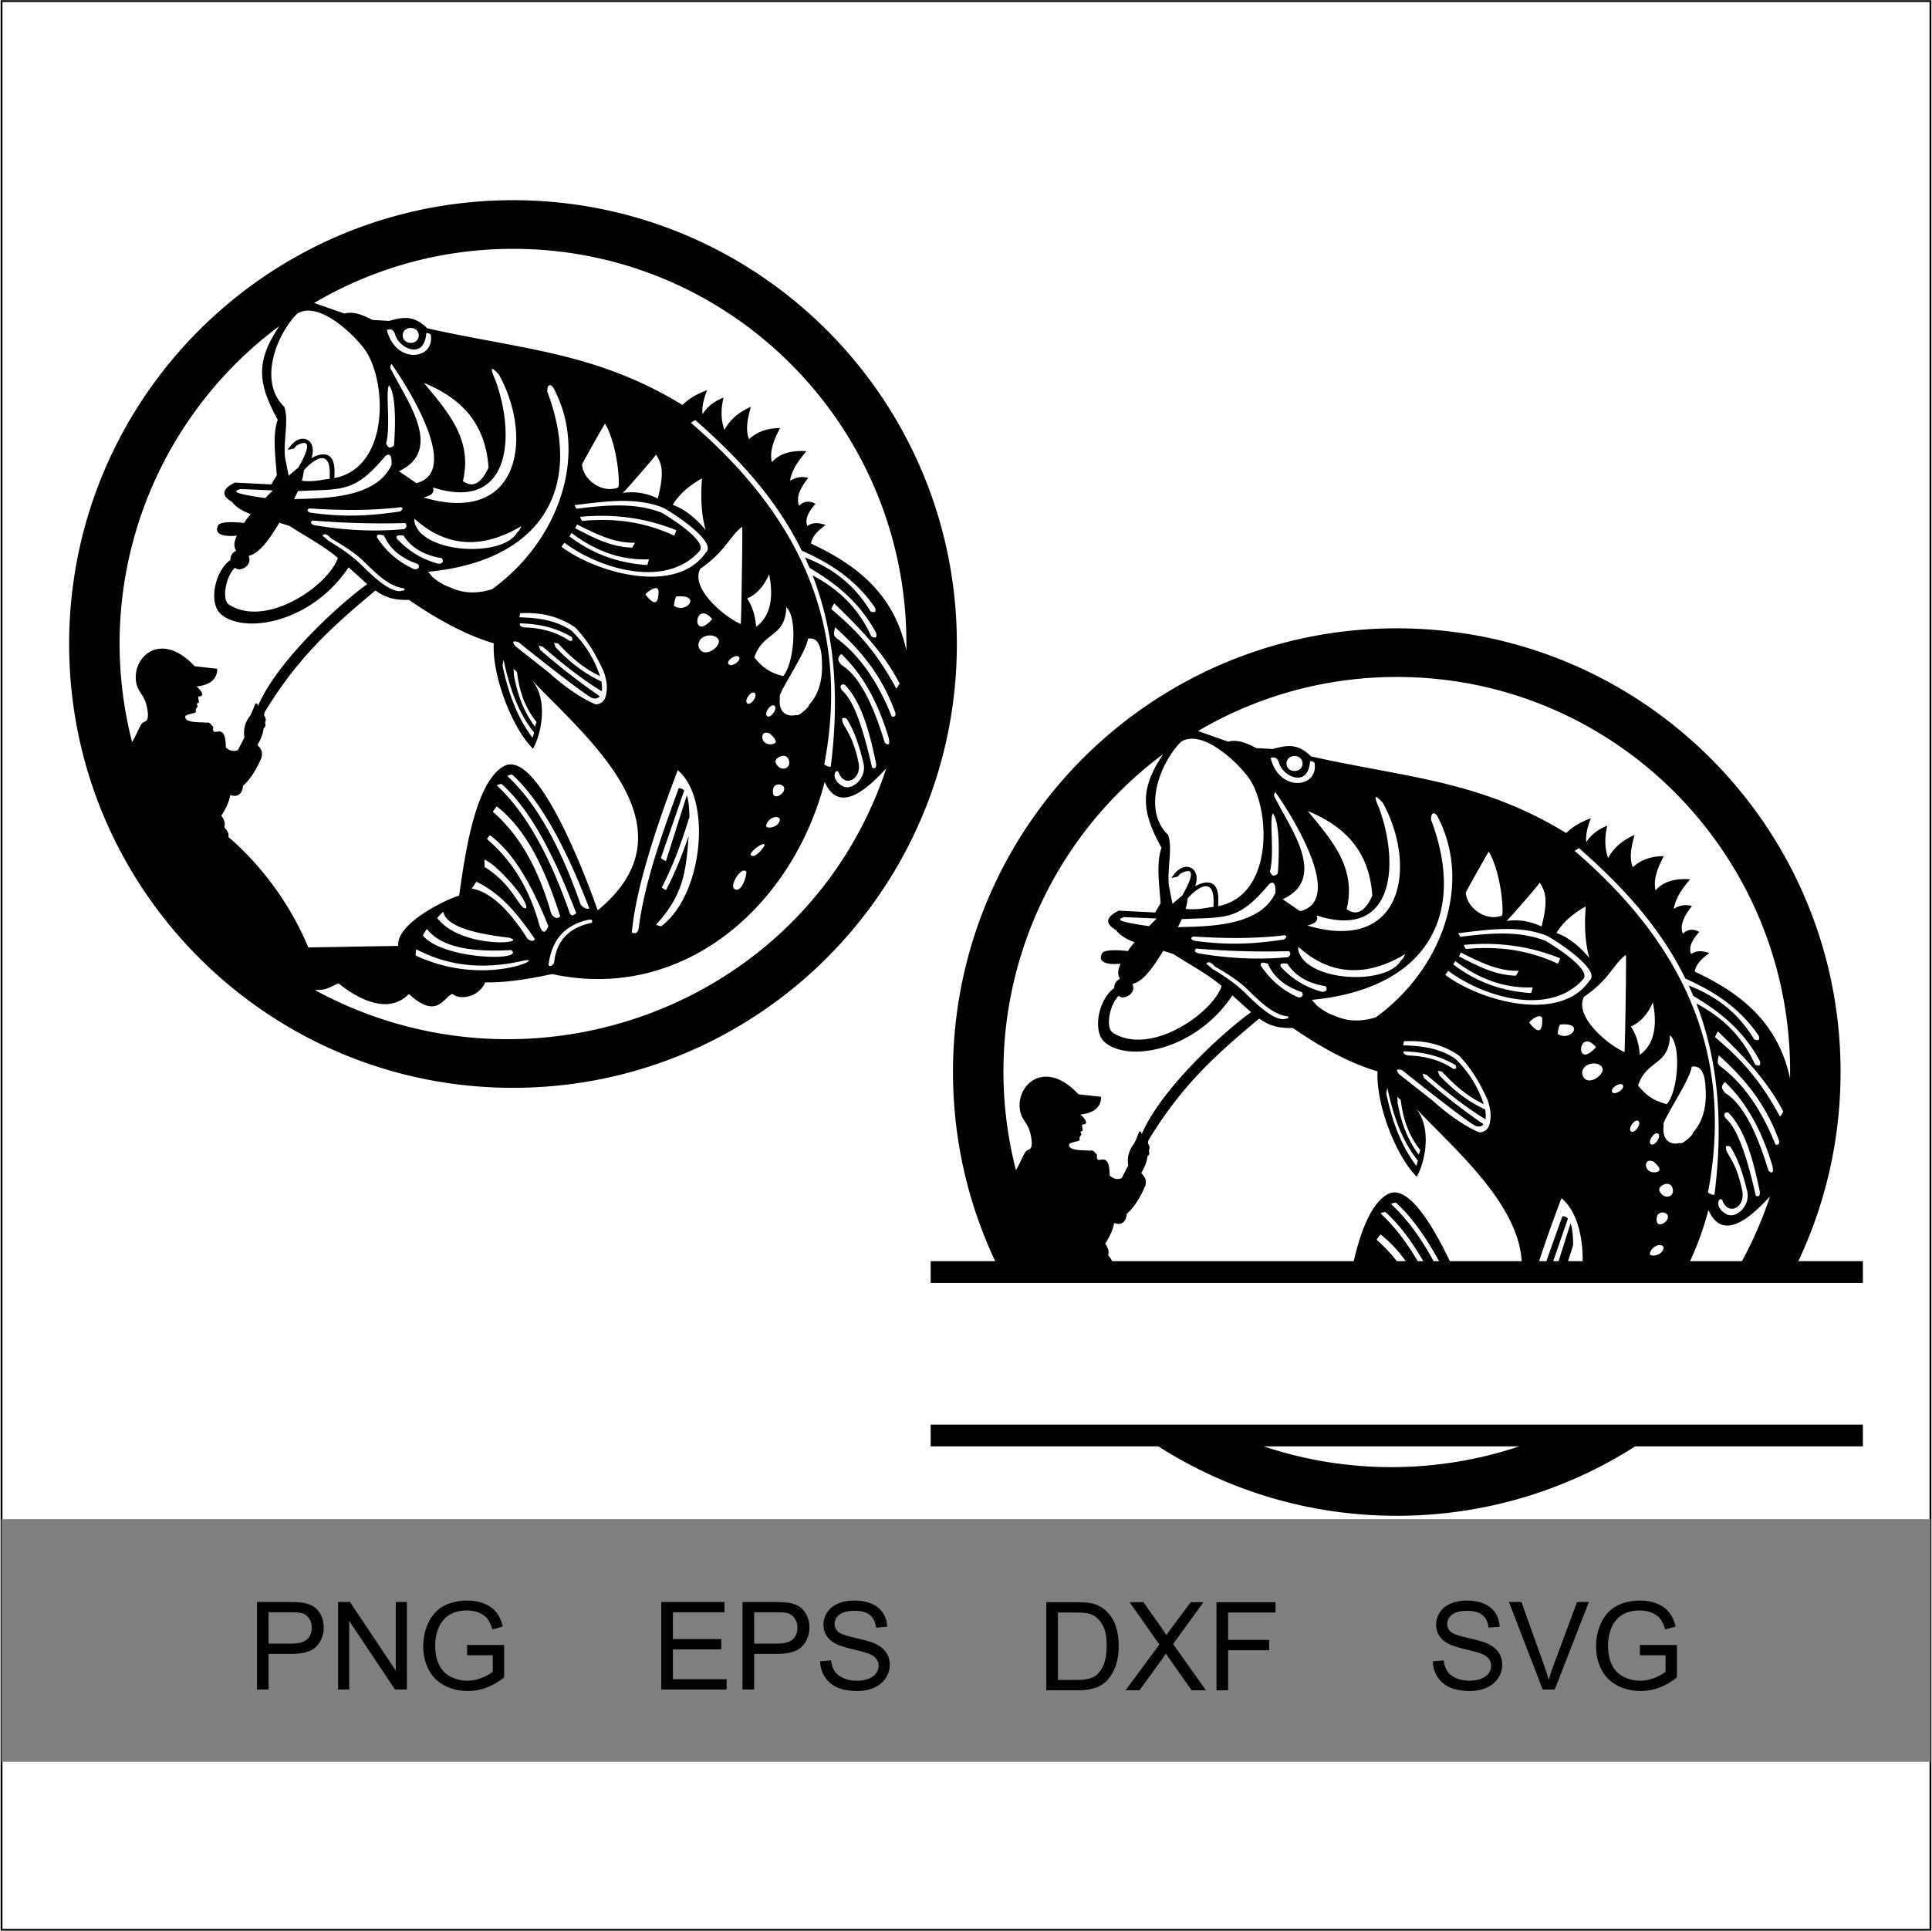 Download Fishing Svg Fishing Dxf Fishing Silhouette Cutting Files Etsy